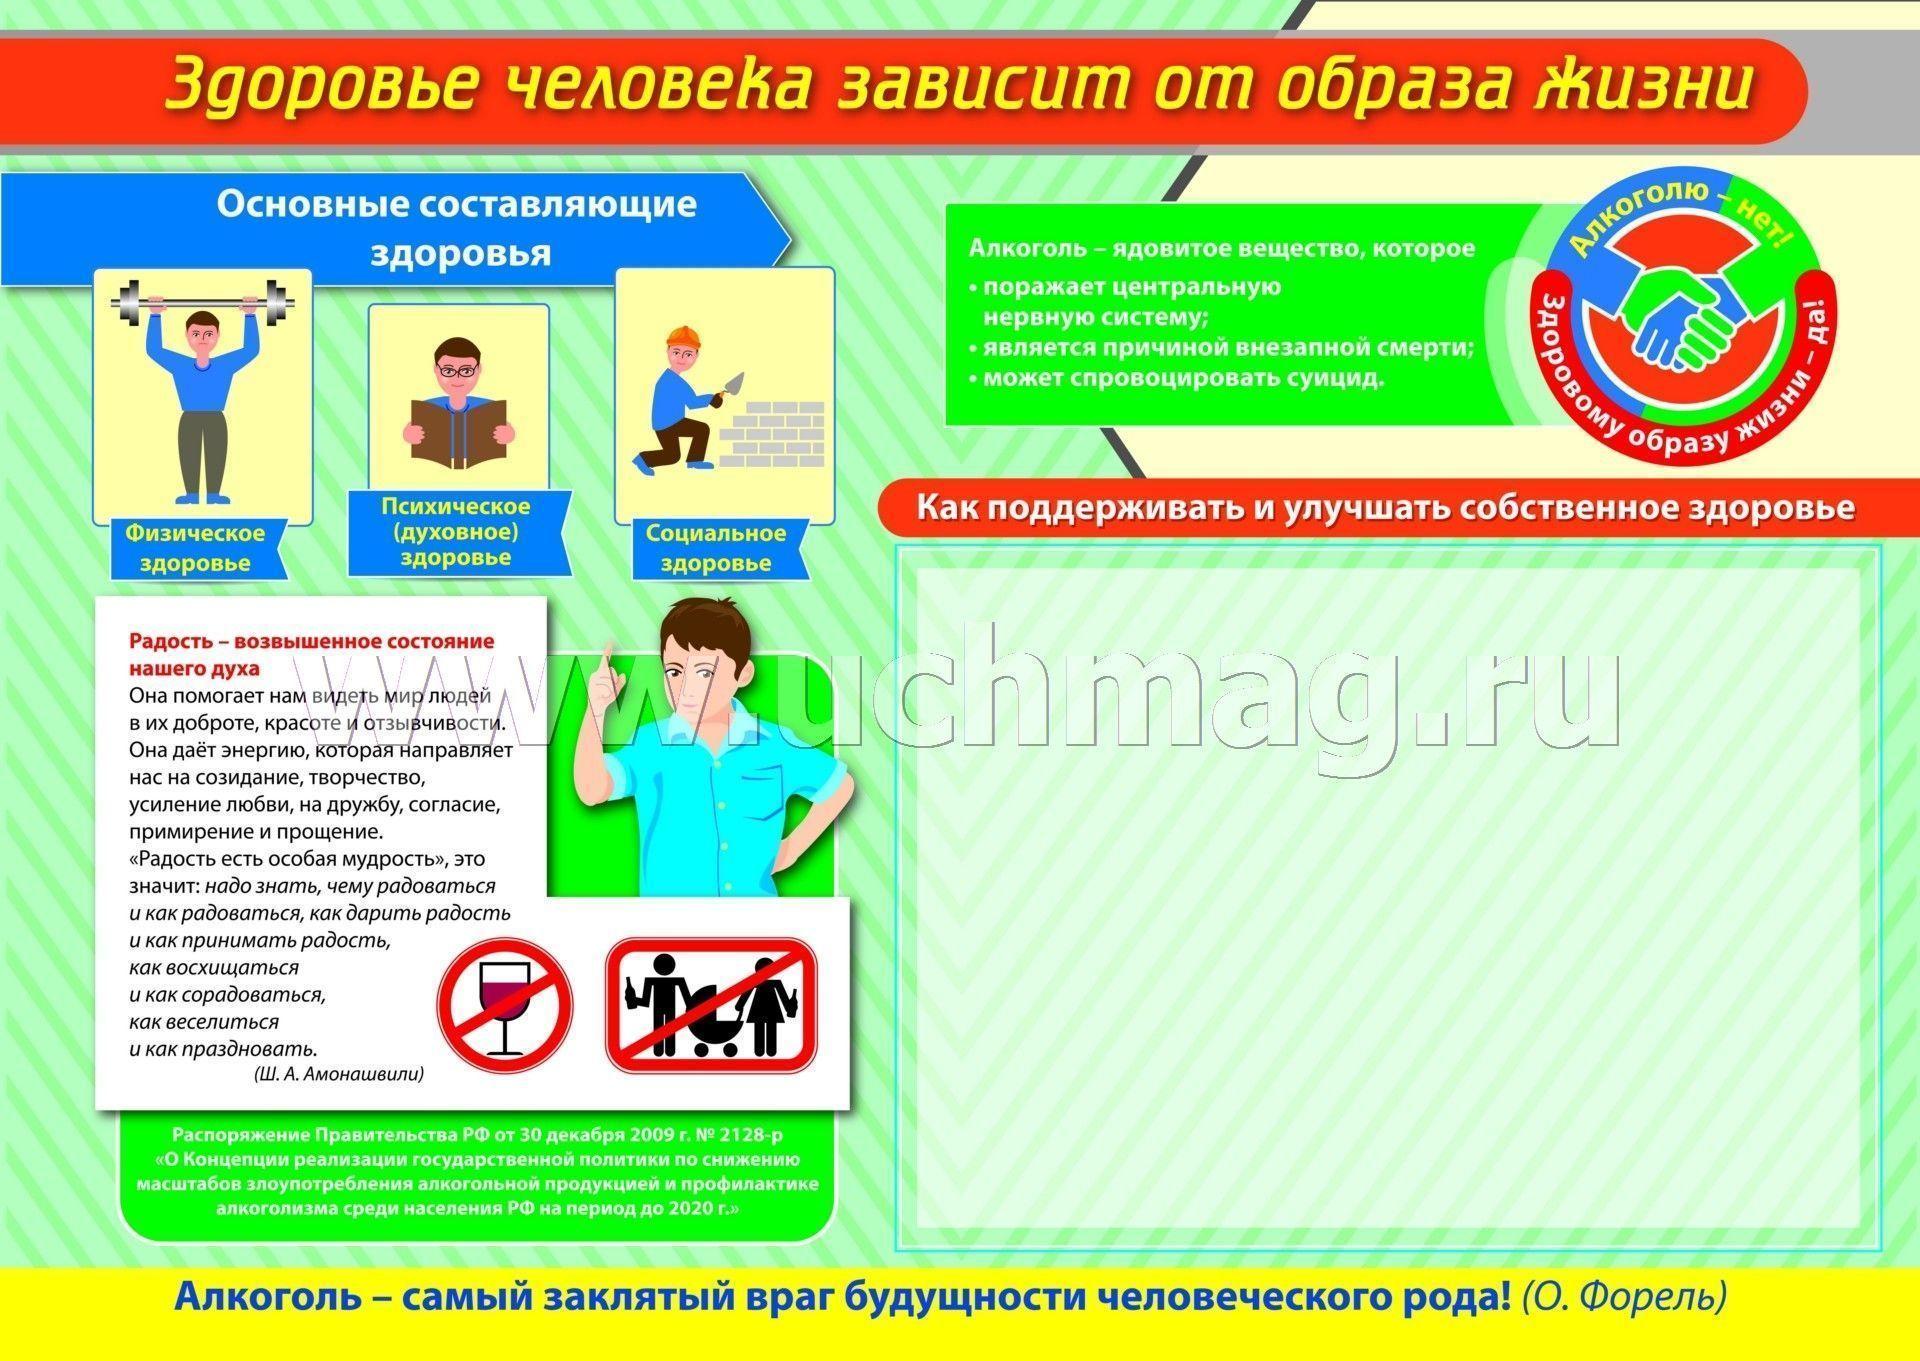 Профилактика на dvd алкоголизма ска лечение алкоголизма Москве цена